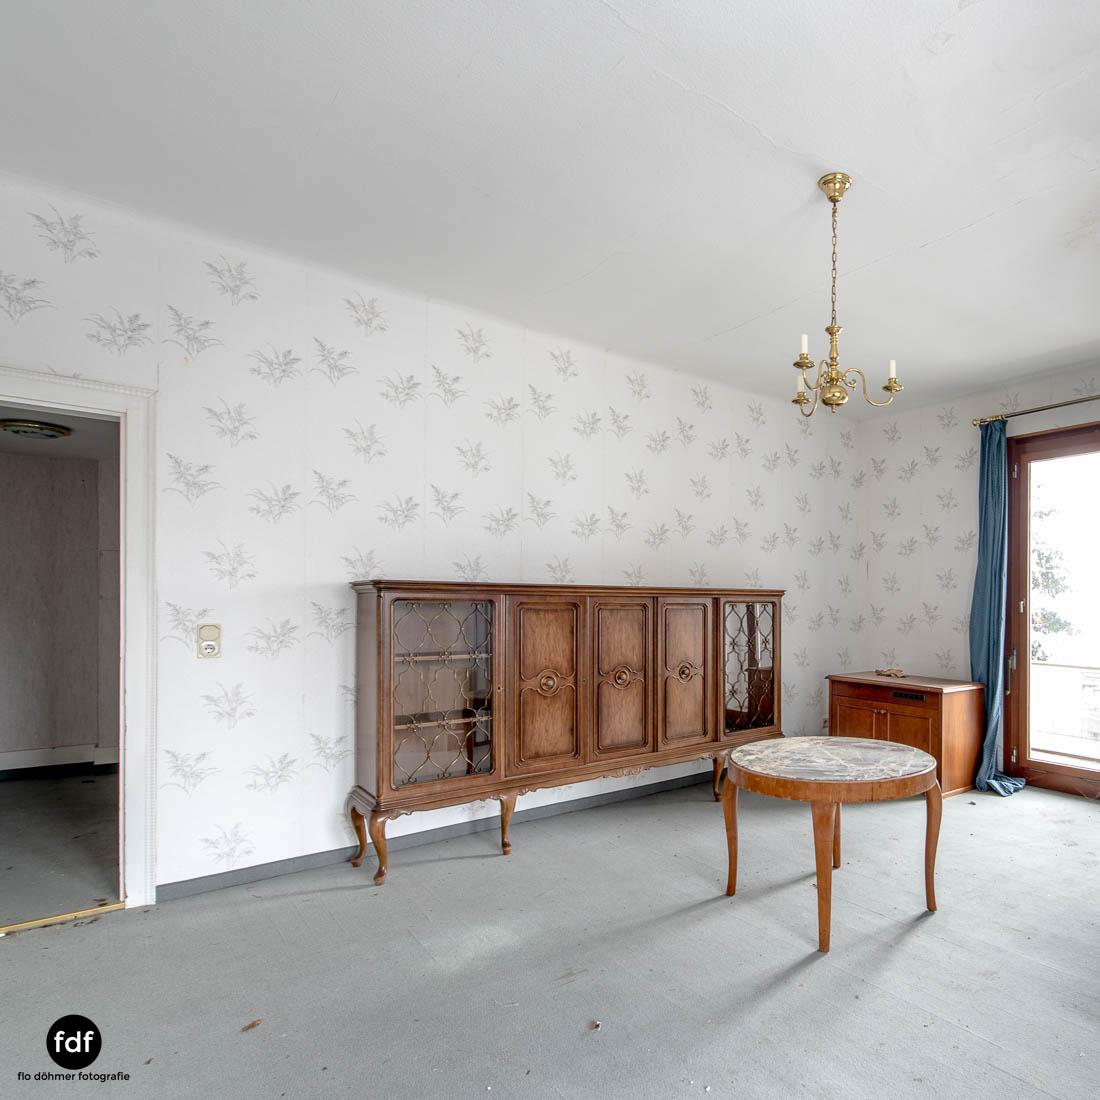 Grand-Hotel-Waldlust-Urbex-Verfall-Freudenstadt-Schwarzwald-130.jpg